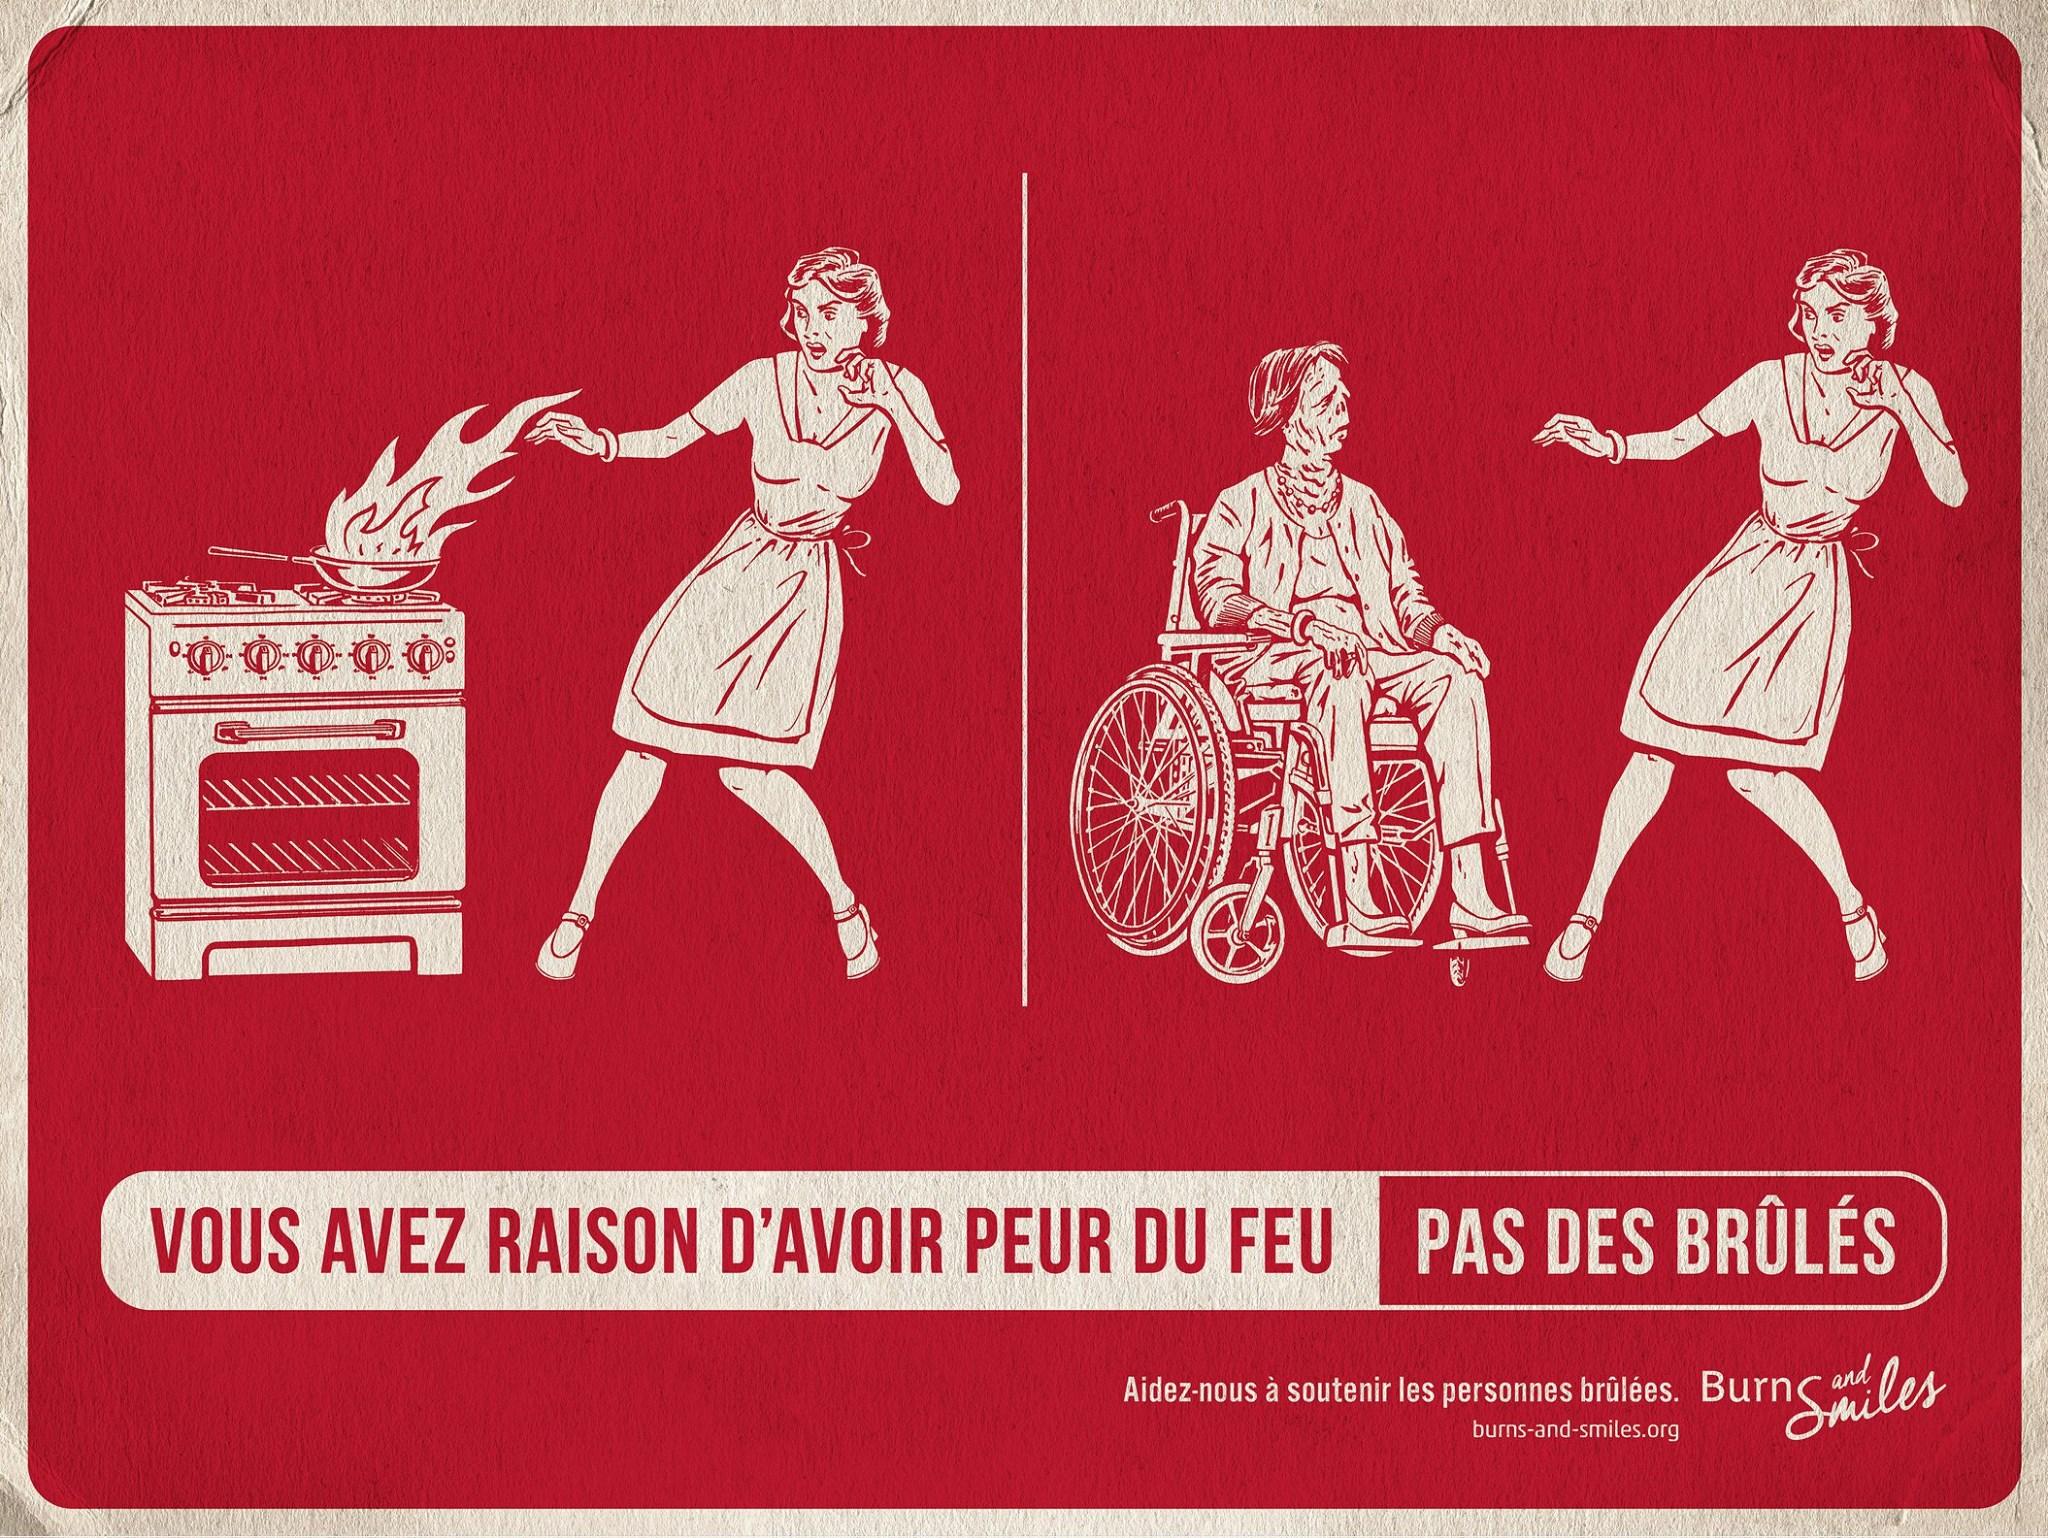 burns-and-smiles-publicite-communication-print-press-ad-feu-brules-burn-agence-tbwa-paris-2